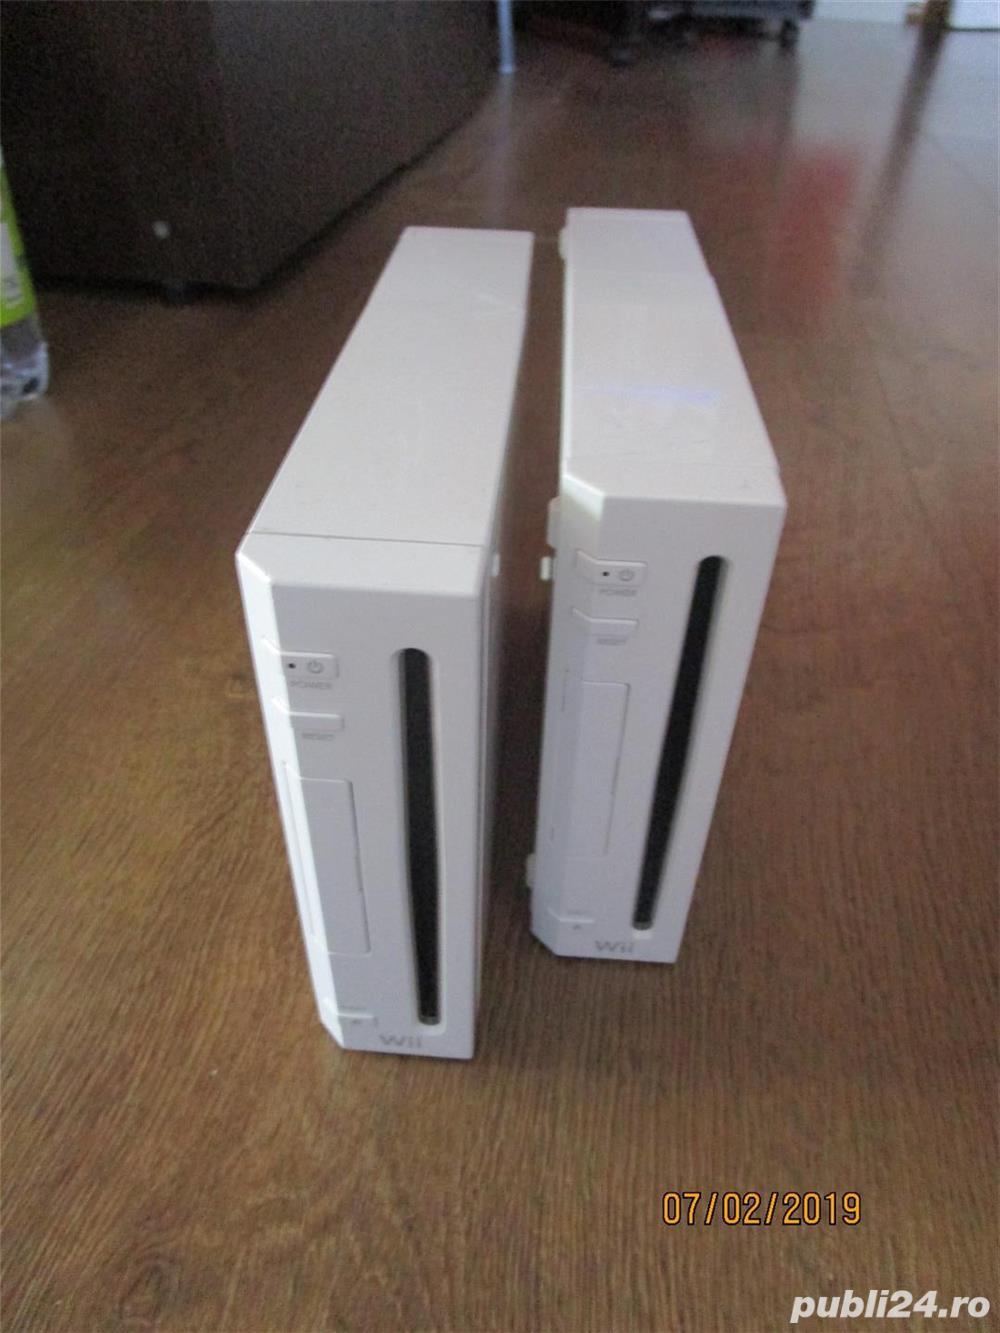 Consola Nintendo Wii MODATA + stand